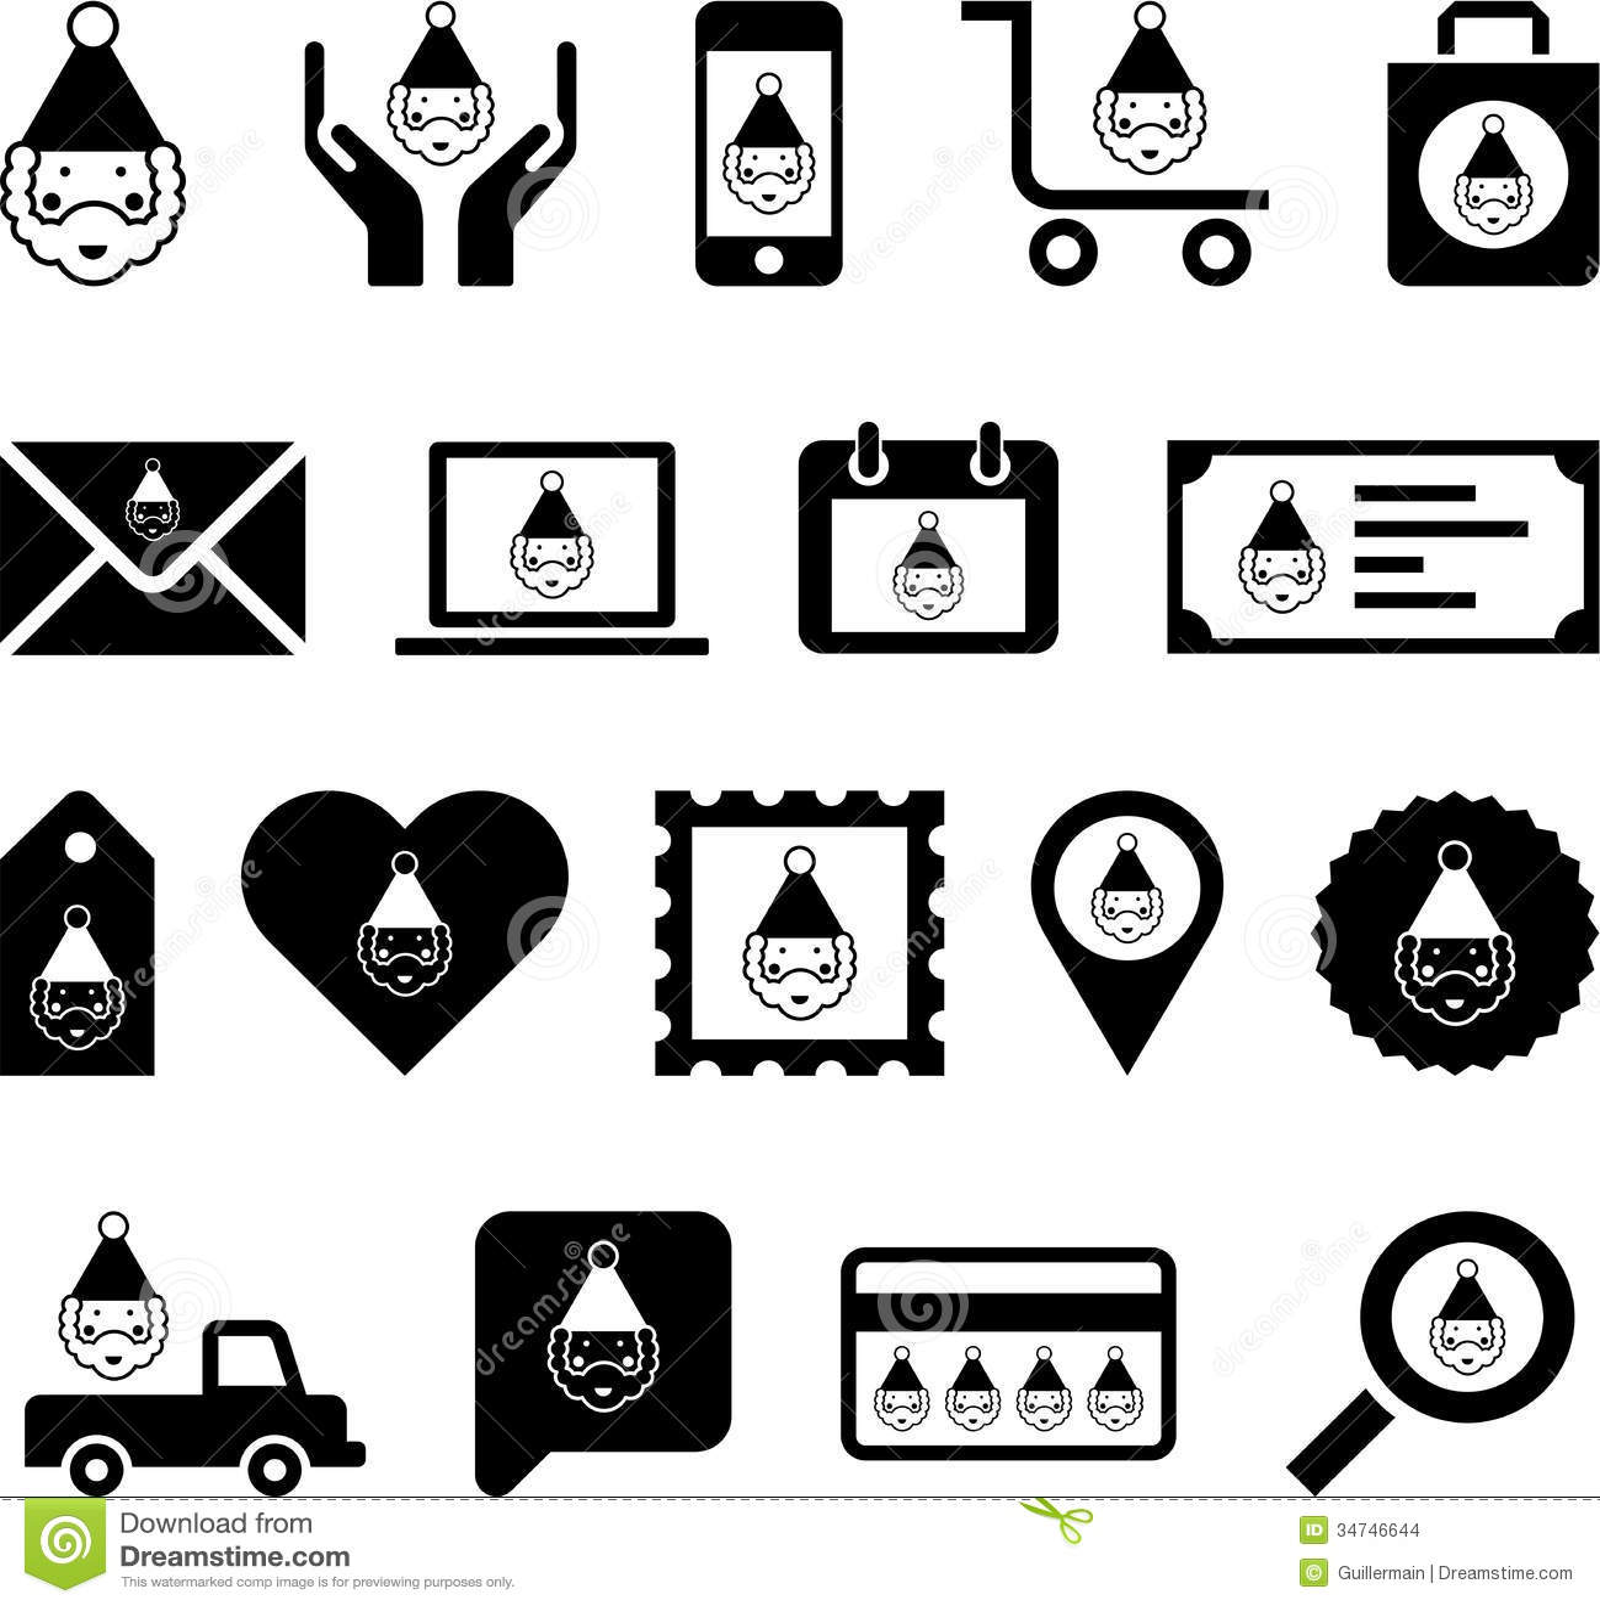 Santa Claus Icons Or Symbols Stock Vector Illustration Of Heart